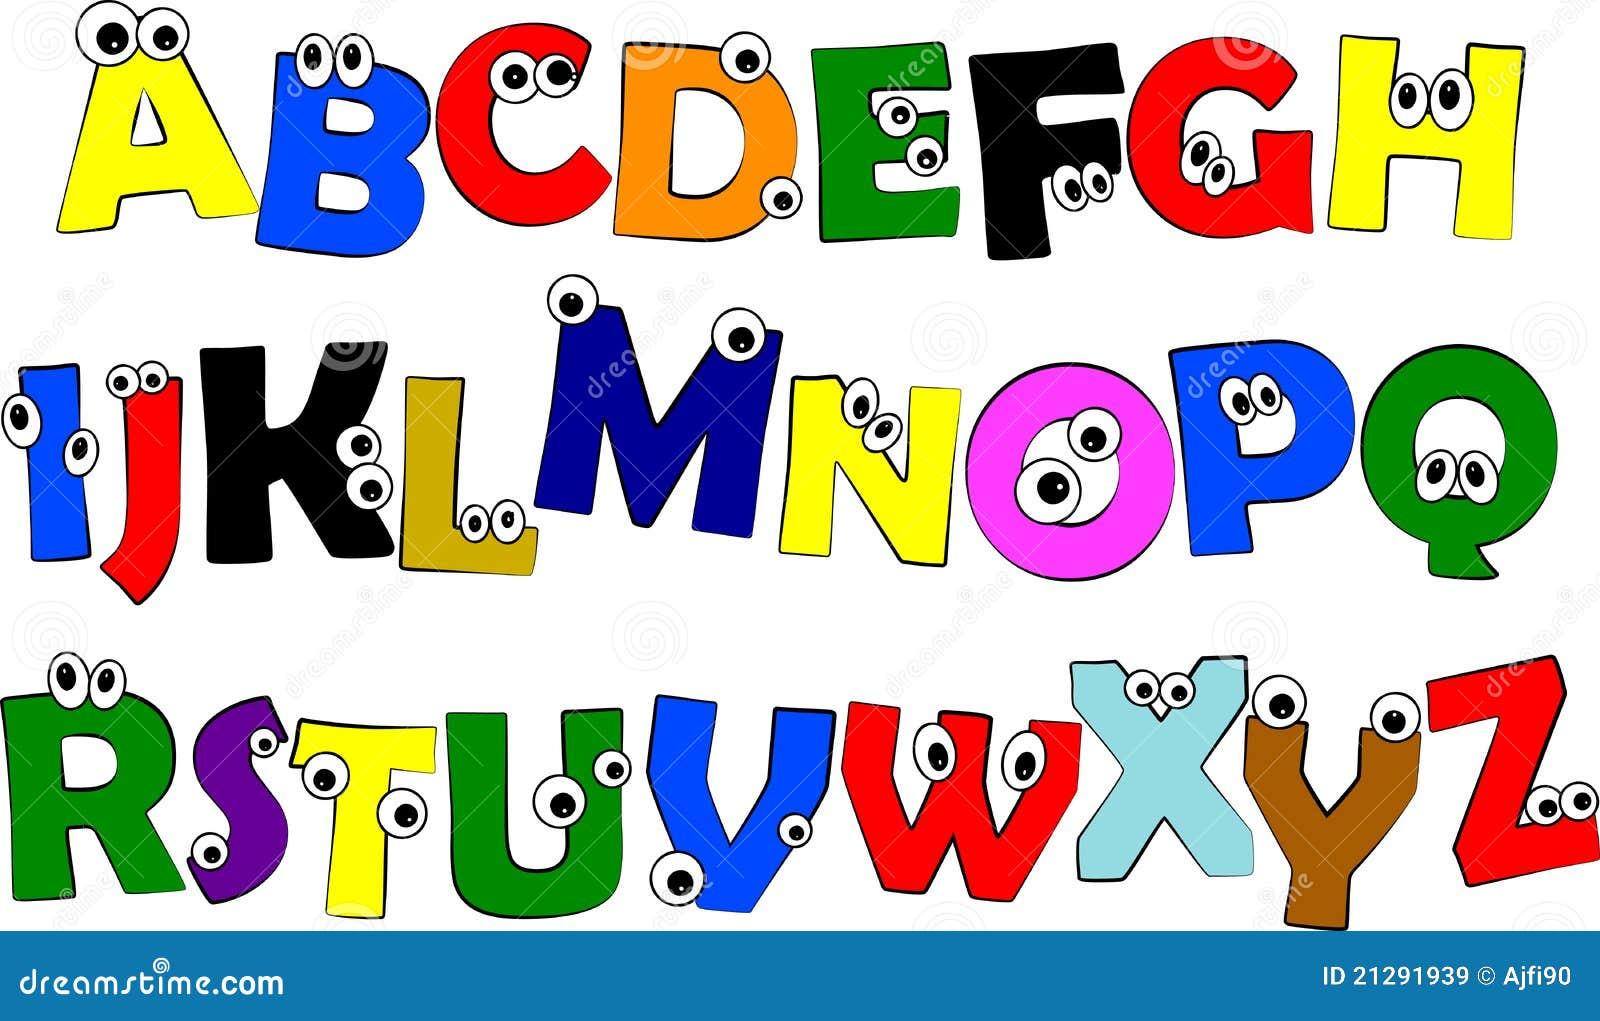 Alphabet Royalty Free Stock Images - Image: 21291939